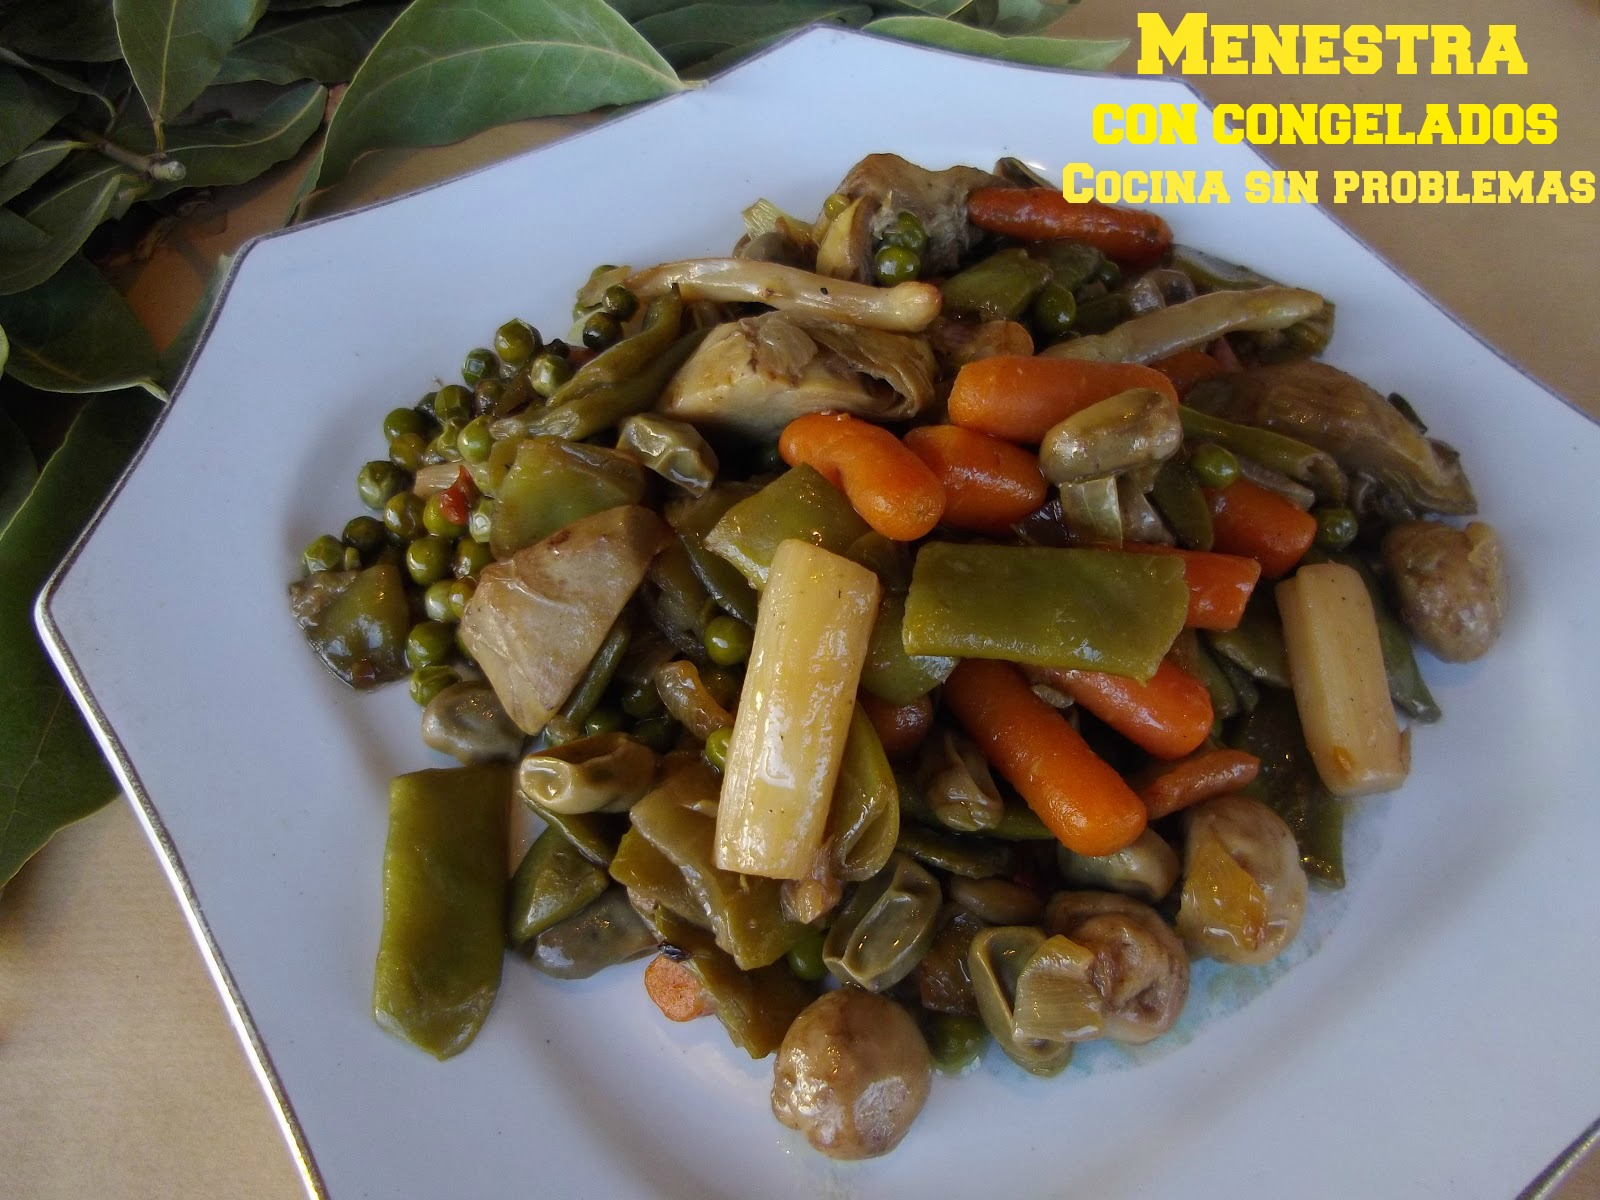 Cocina sin problemas menestra de verduras con congelados - Menestra de verduras en texturas ...